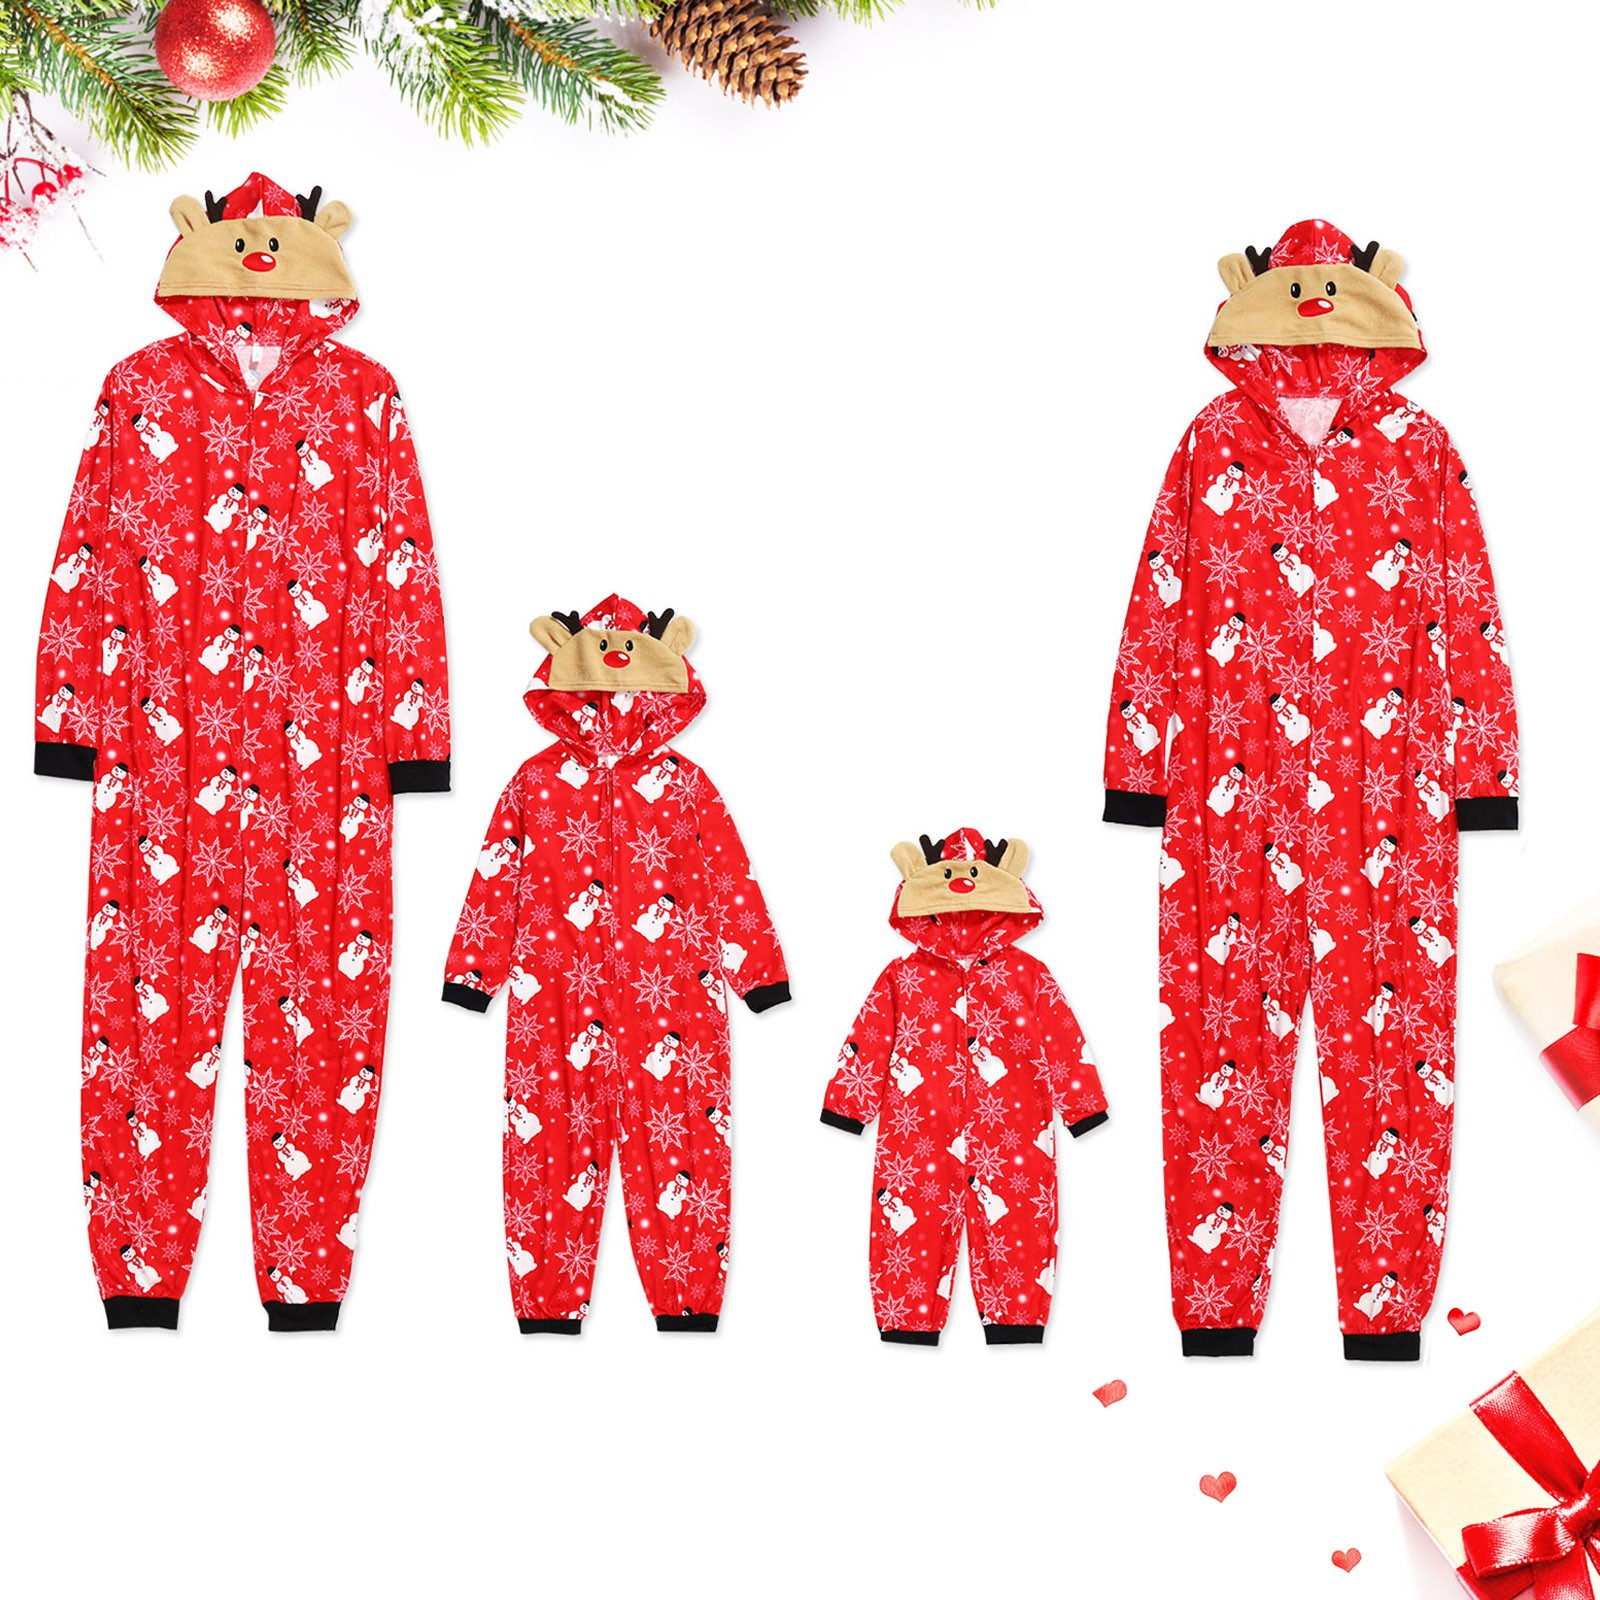 Christmas 2020 Baby Romper Family Matching Clothes Pajamas Sleepwear Snowman christmas hoodie pijamas de navidad familiar